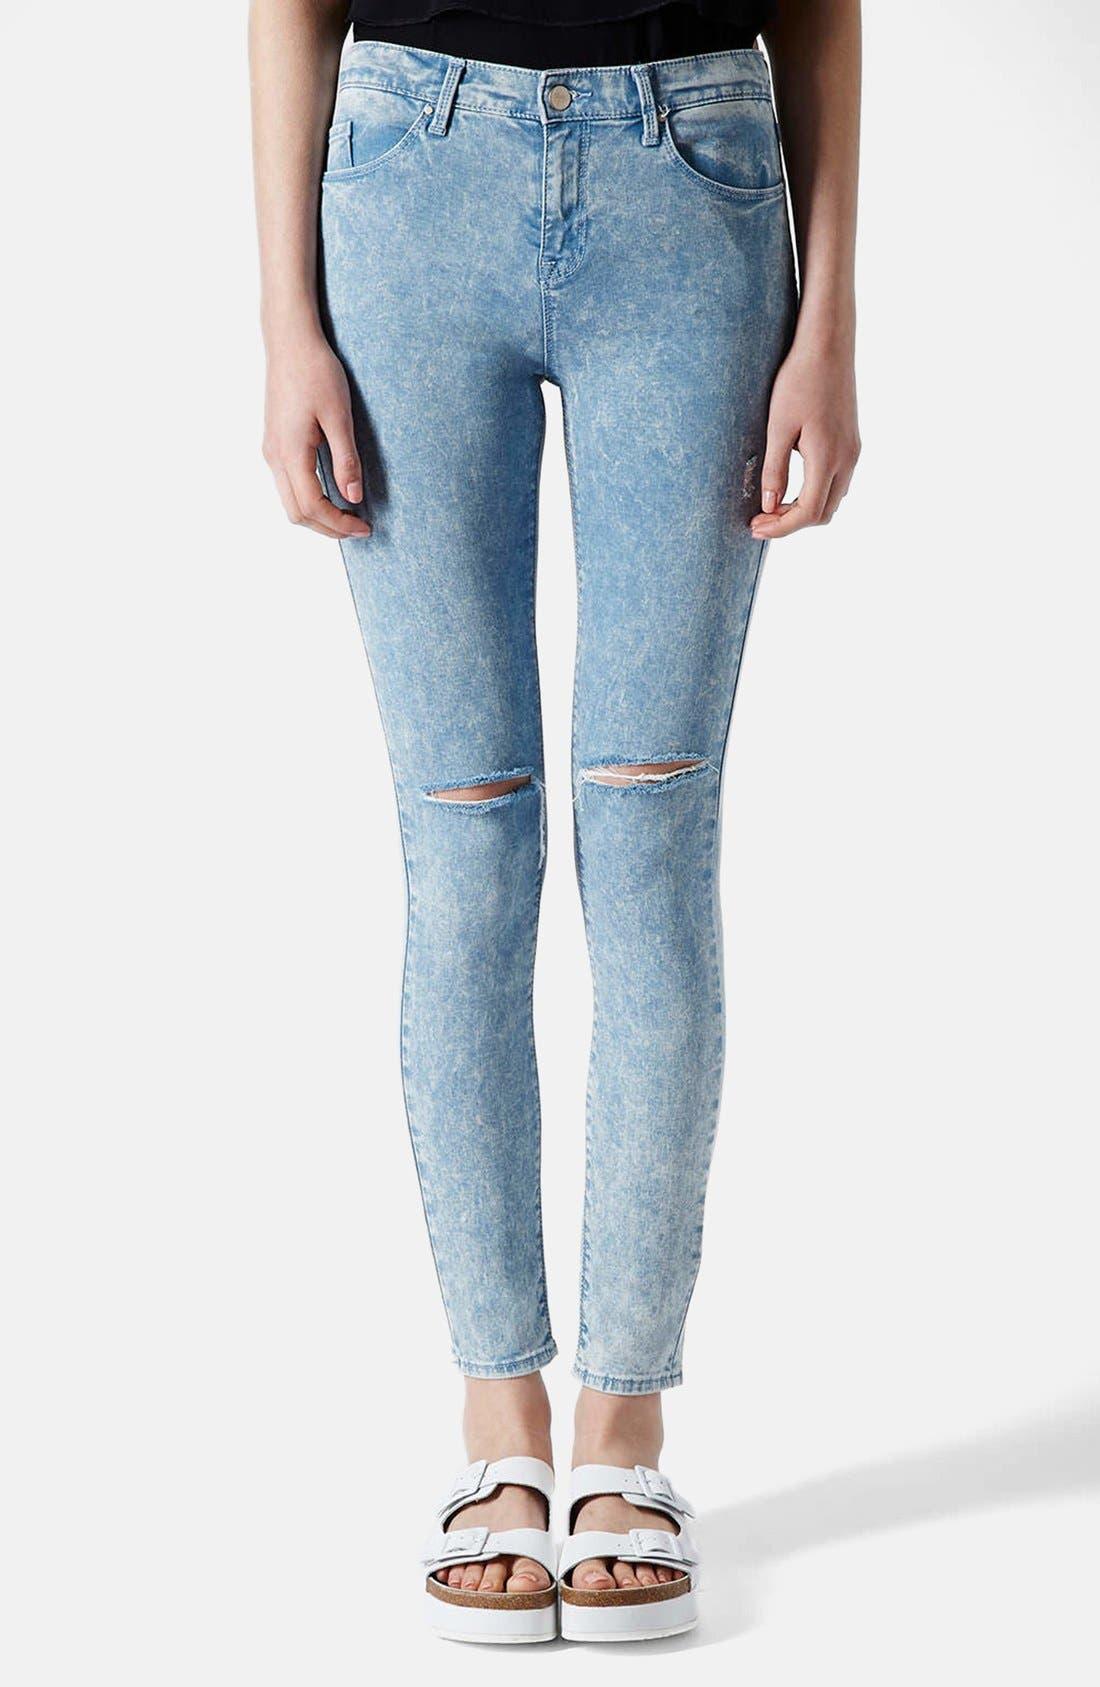 Main Image - Topshop Moto 'Leigh' Acid Wash Ripped Skinny Jeans (Light Blue) (Regular & Short)